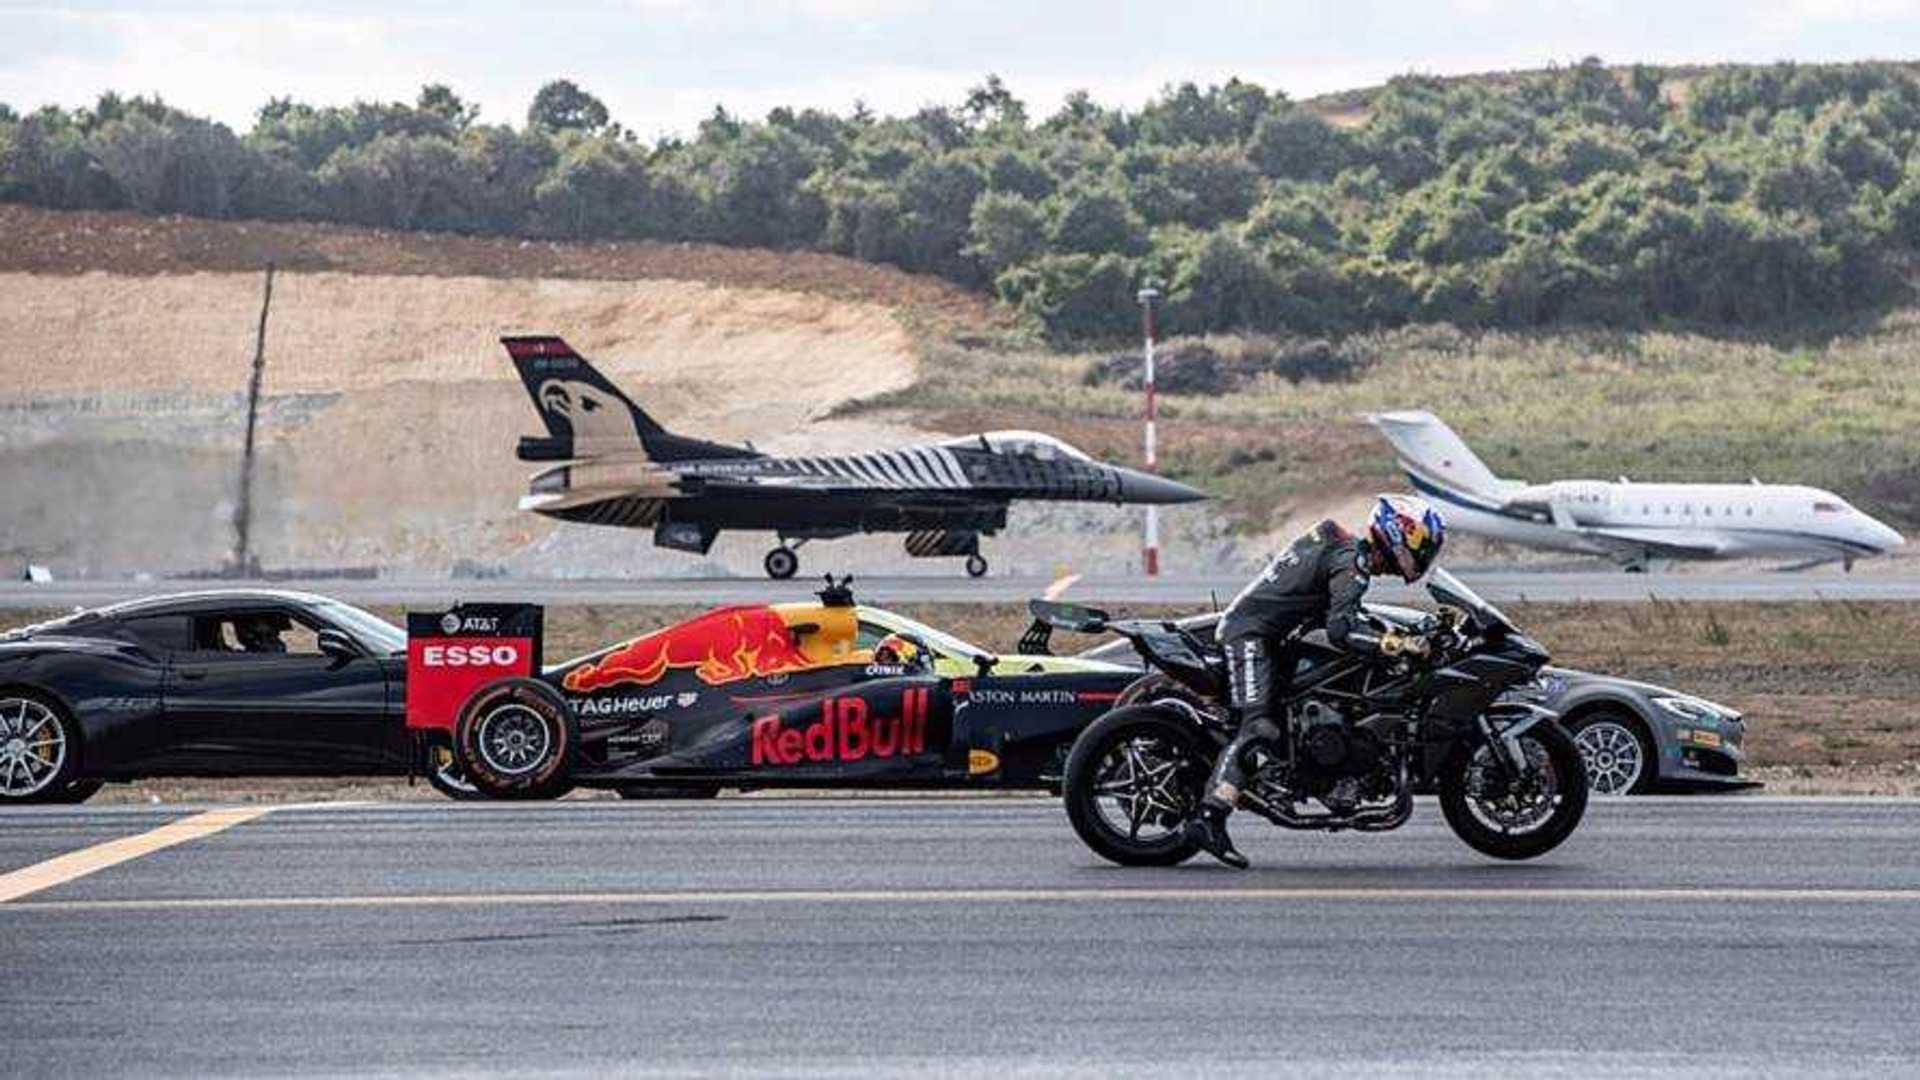 Watch A Tesla Race A Superbike, Formula 1 Car, Jet, Airplane & More